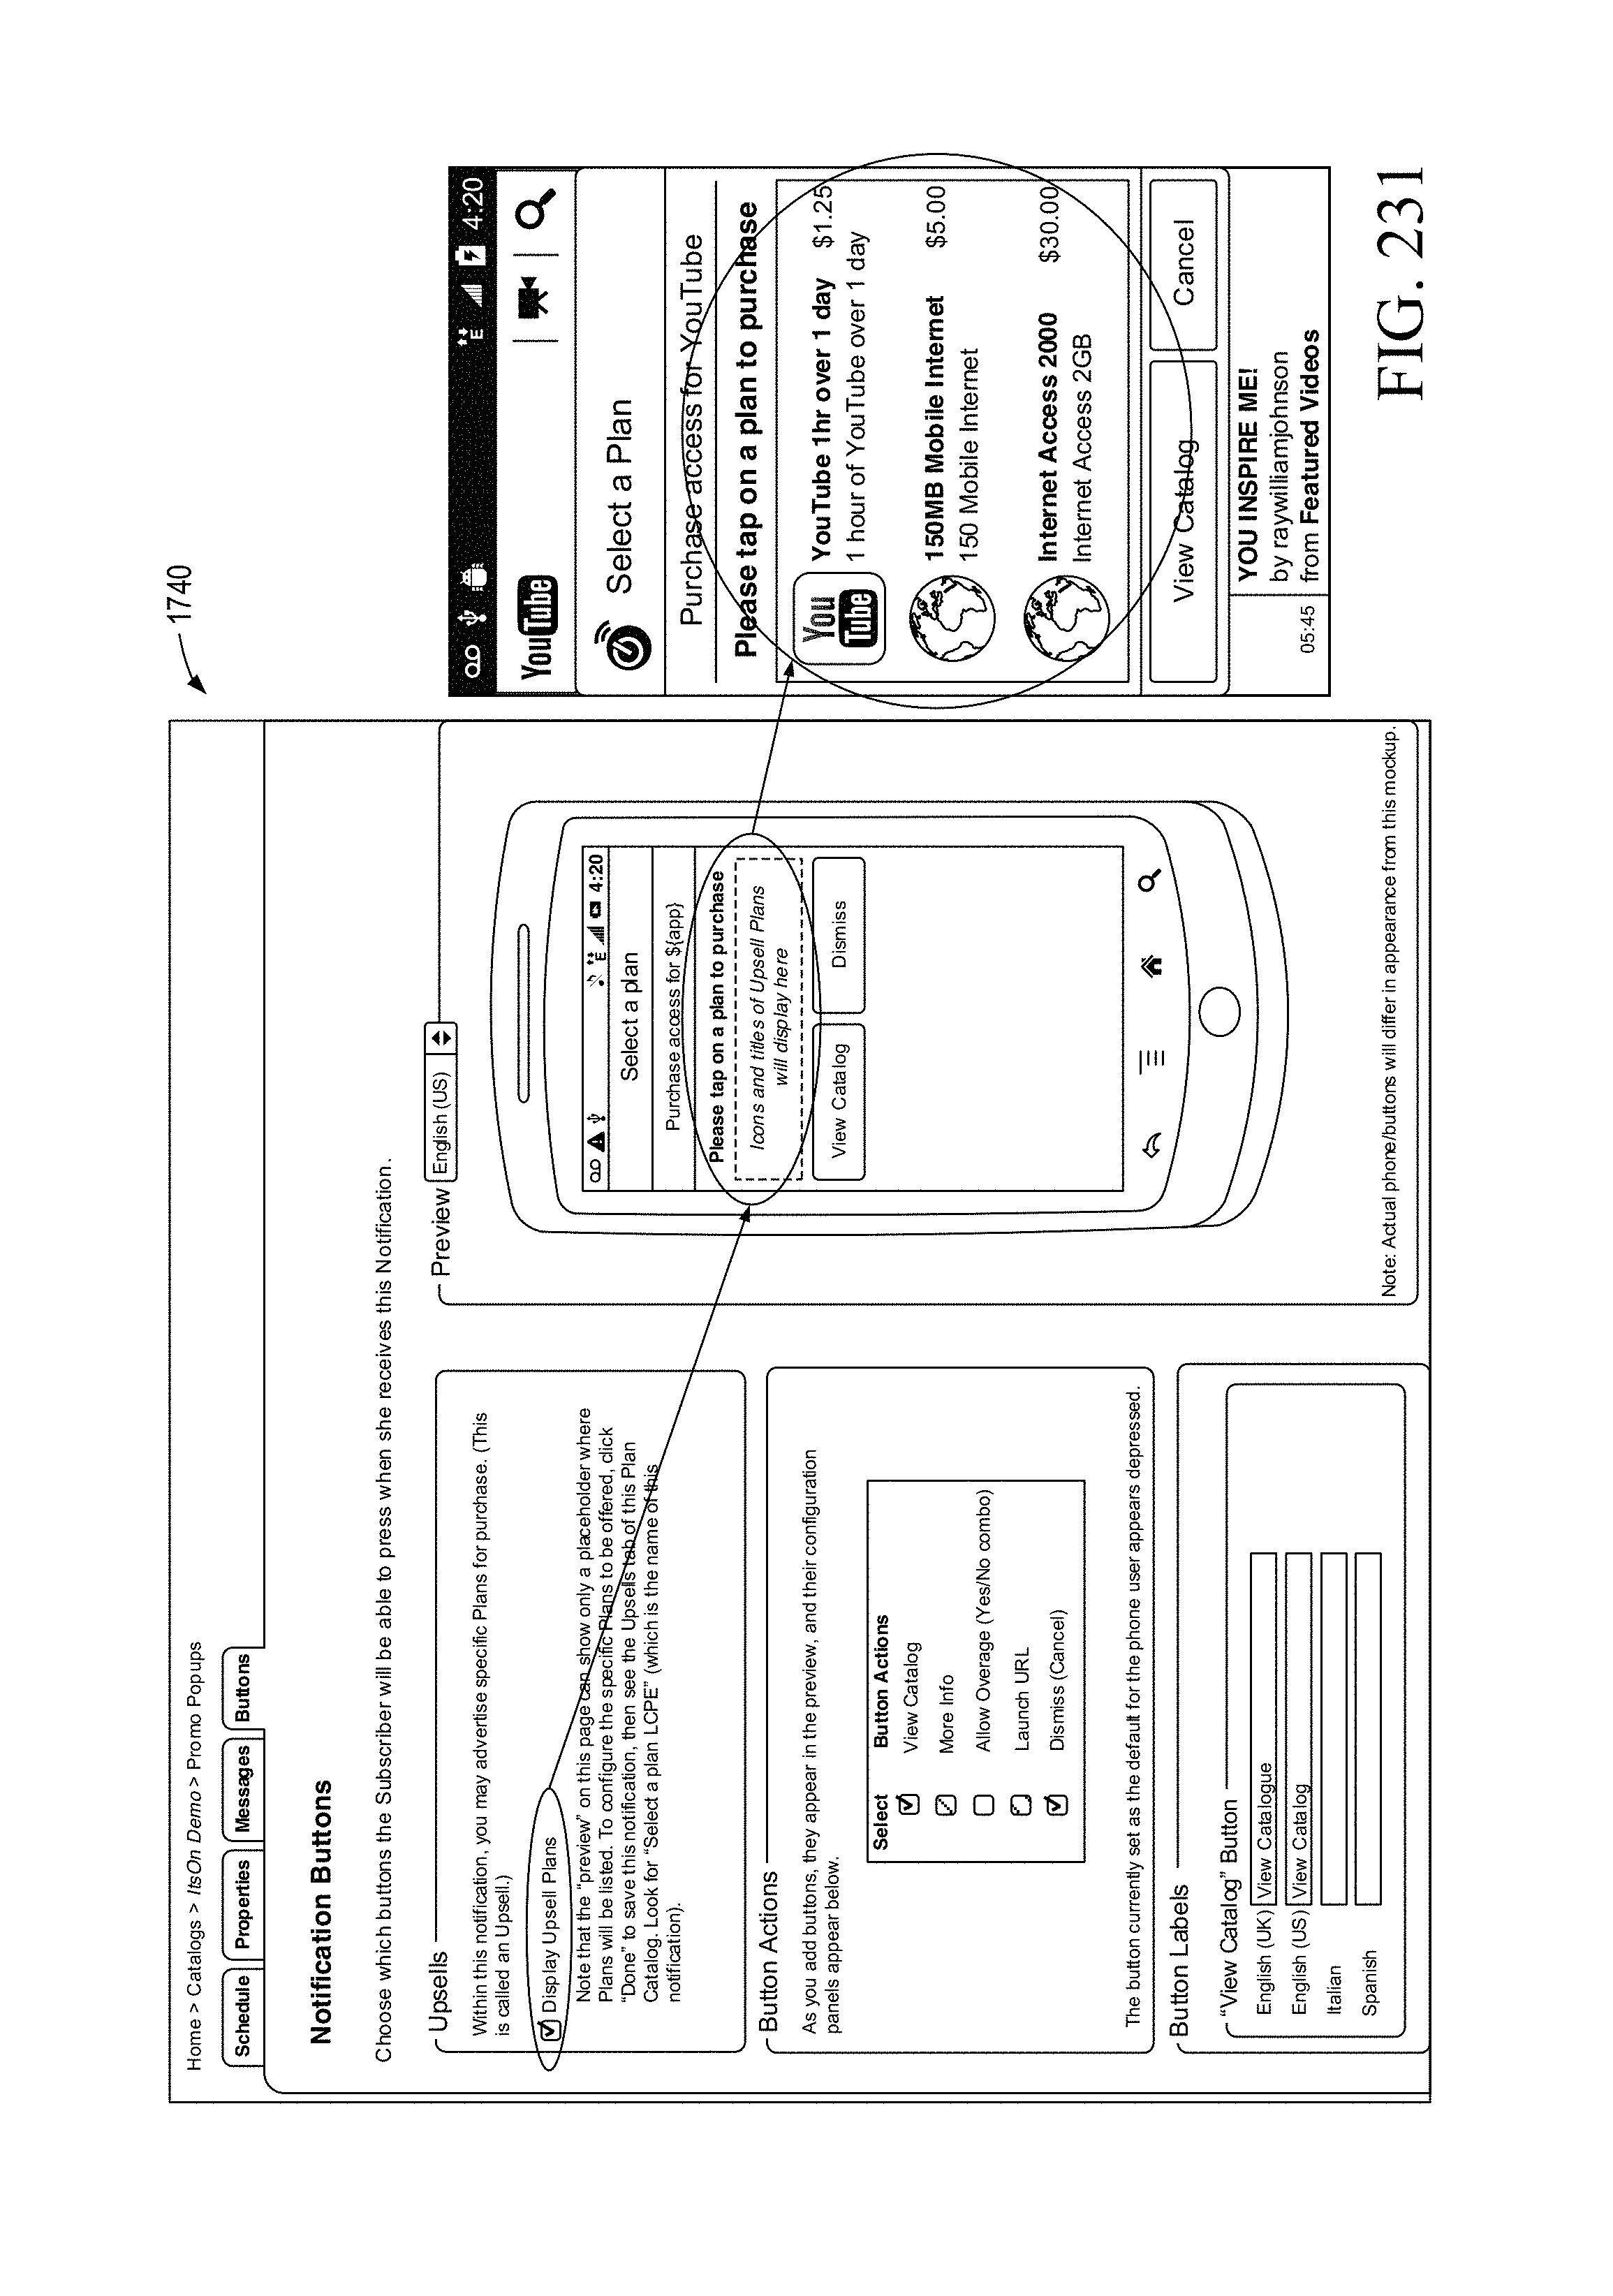 patent us 9,955,332 b2Voiceactivated Tape Recorder Switch Circuit Diagram Tradeoficcom #11